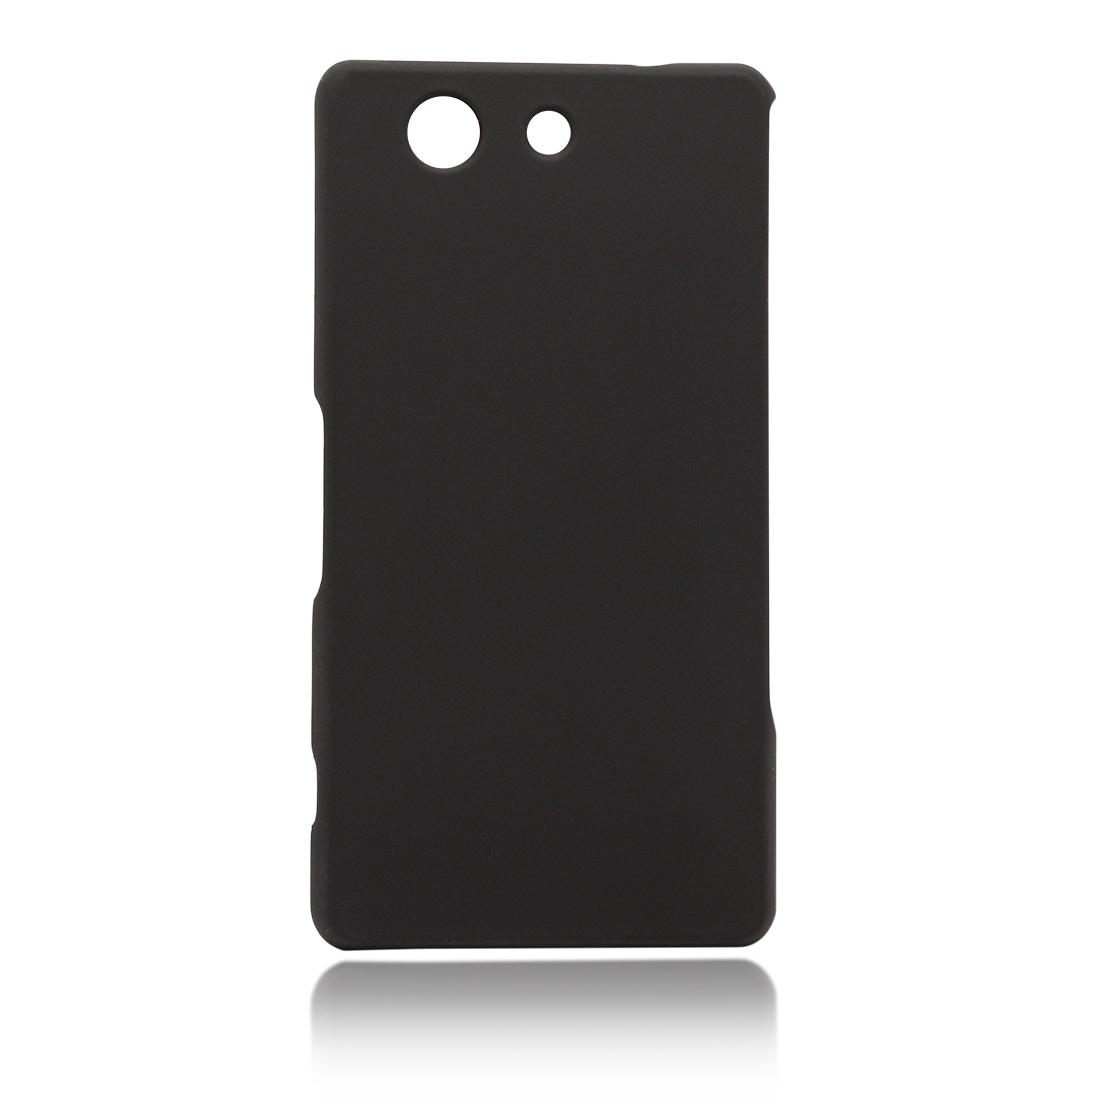 Пластиковая накладка Brosco Soft-touch для Sony Xperia Z3 Compact, черная